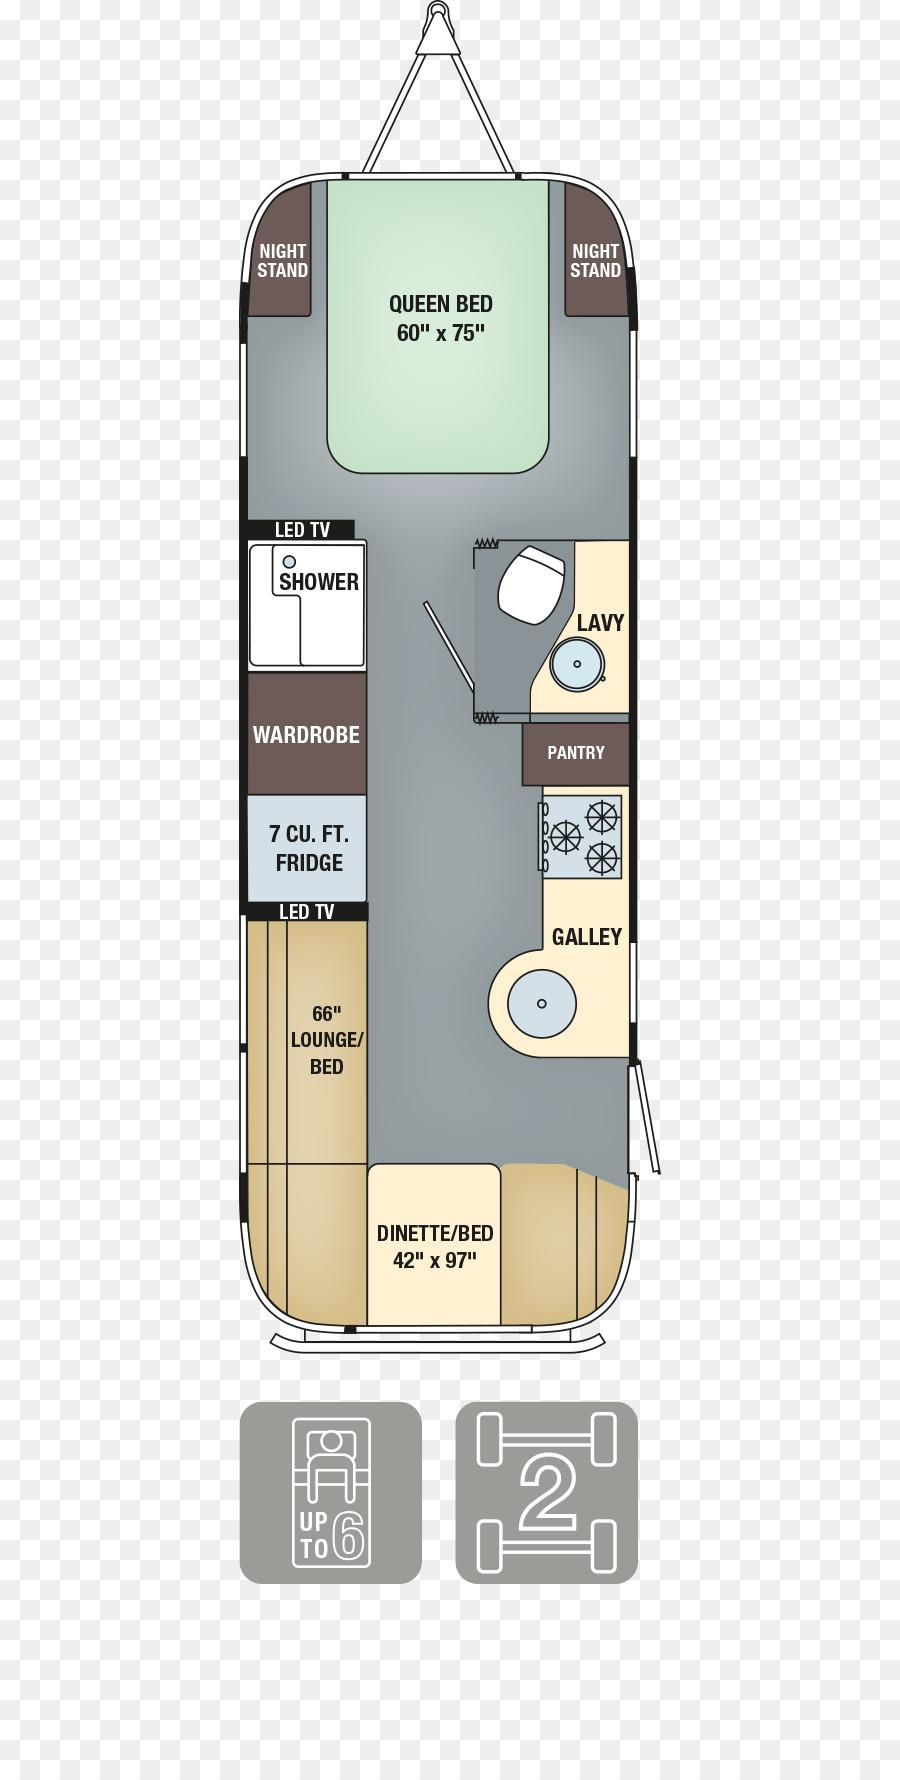 Airstream Floor Plan png download - 625